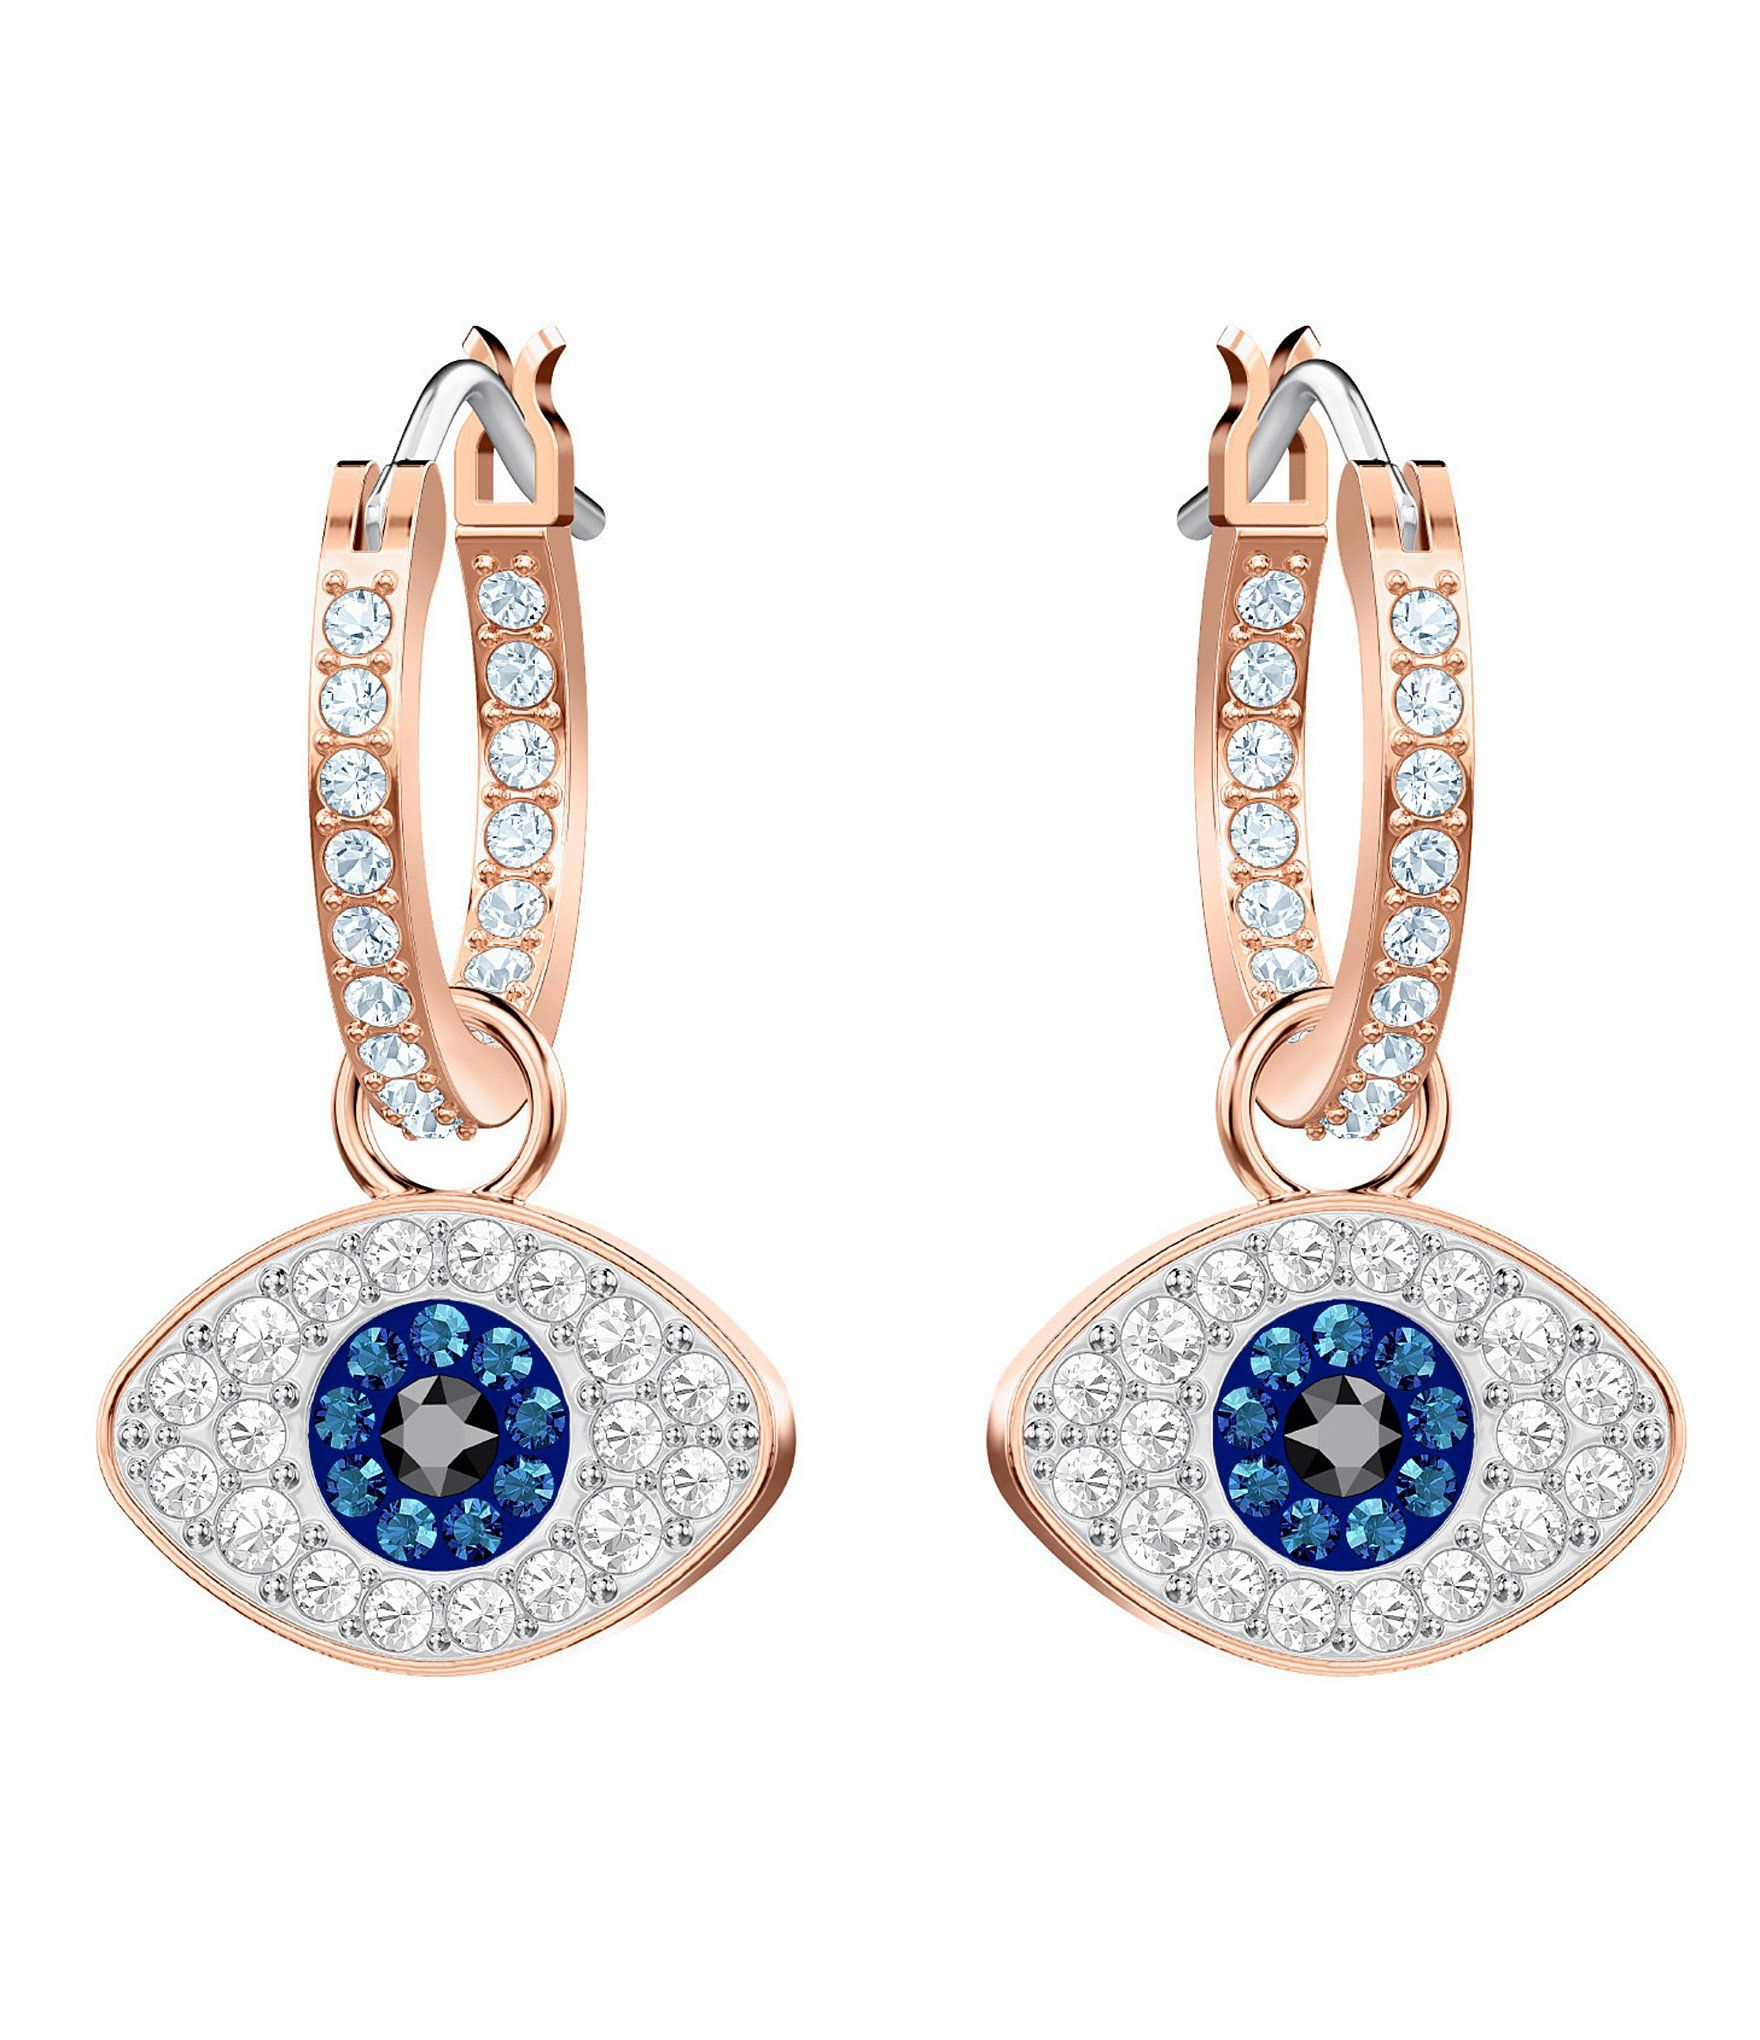 Sterling Silver Rose-toned Half Moon Hoops Earrings by Caterina Jewelry